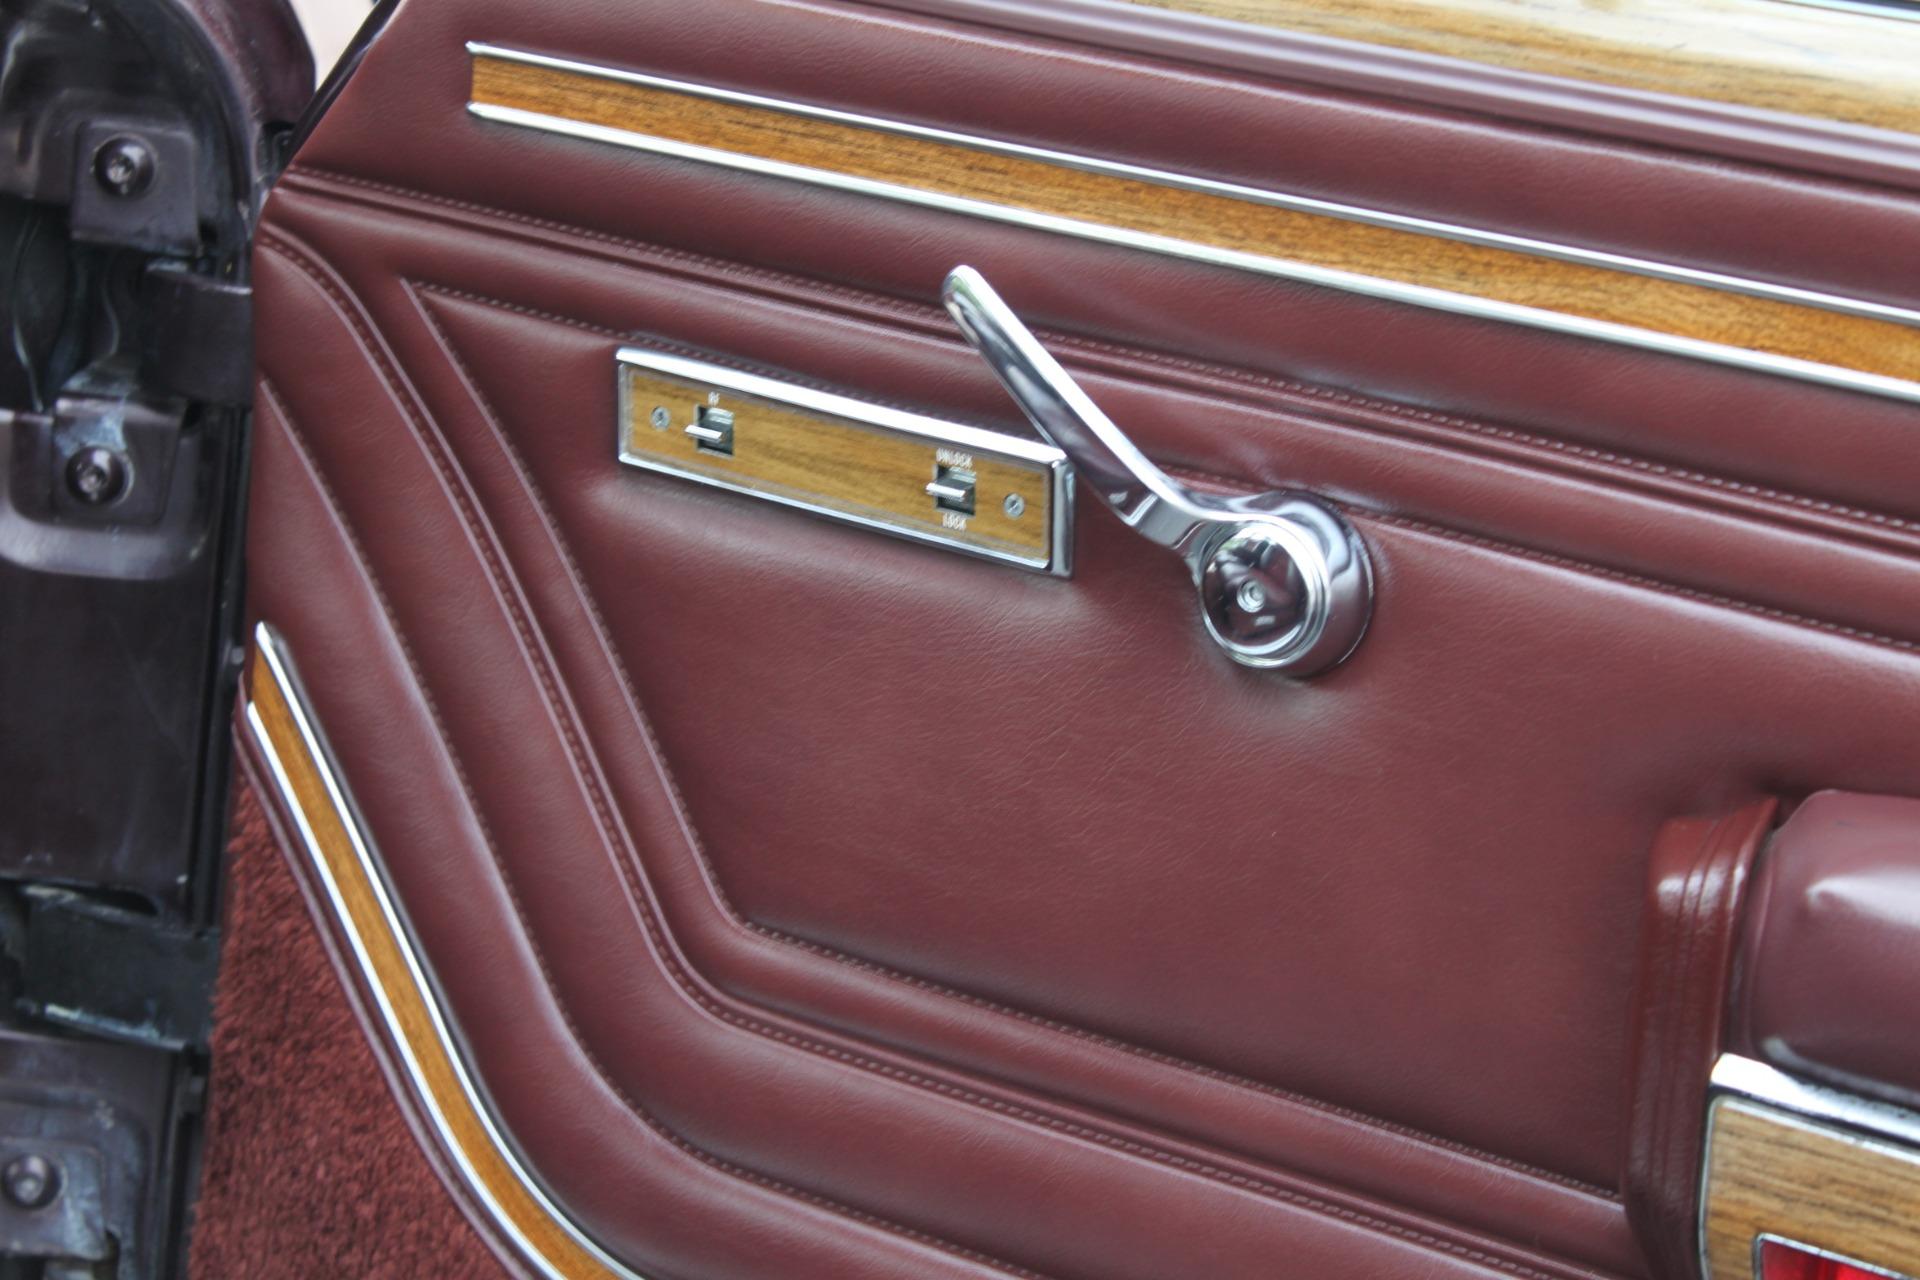 Used-1989-Jeep-Grand-Wagoneer-Classic